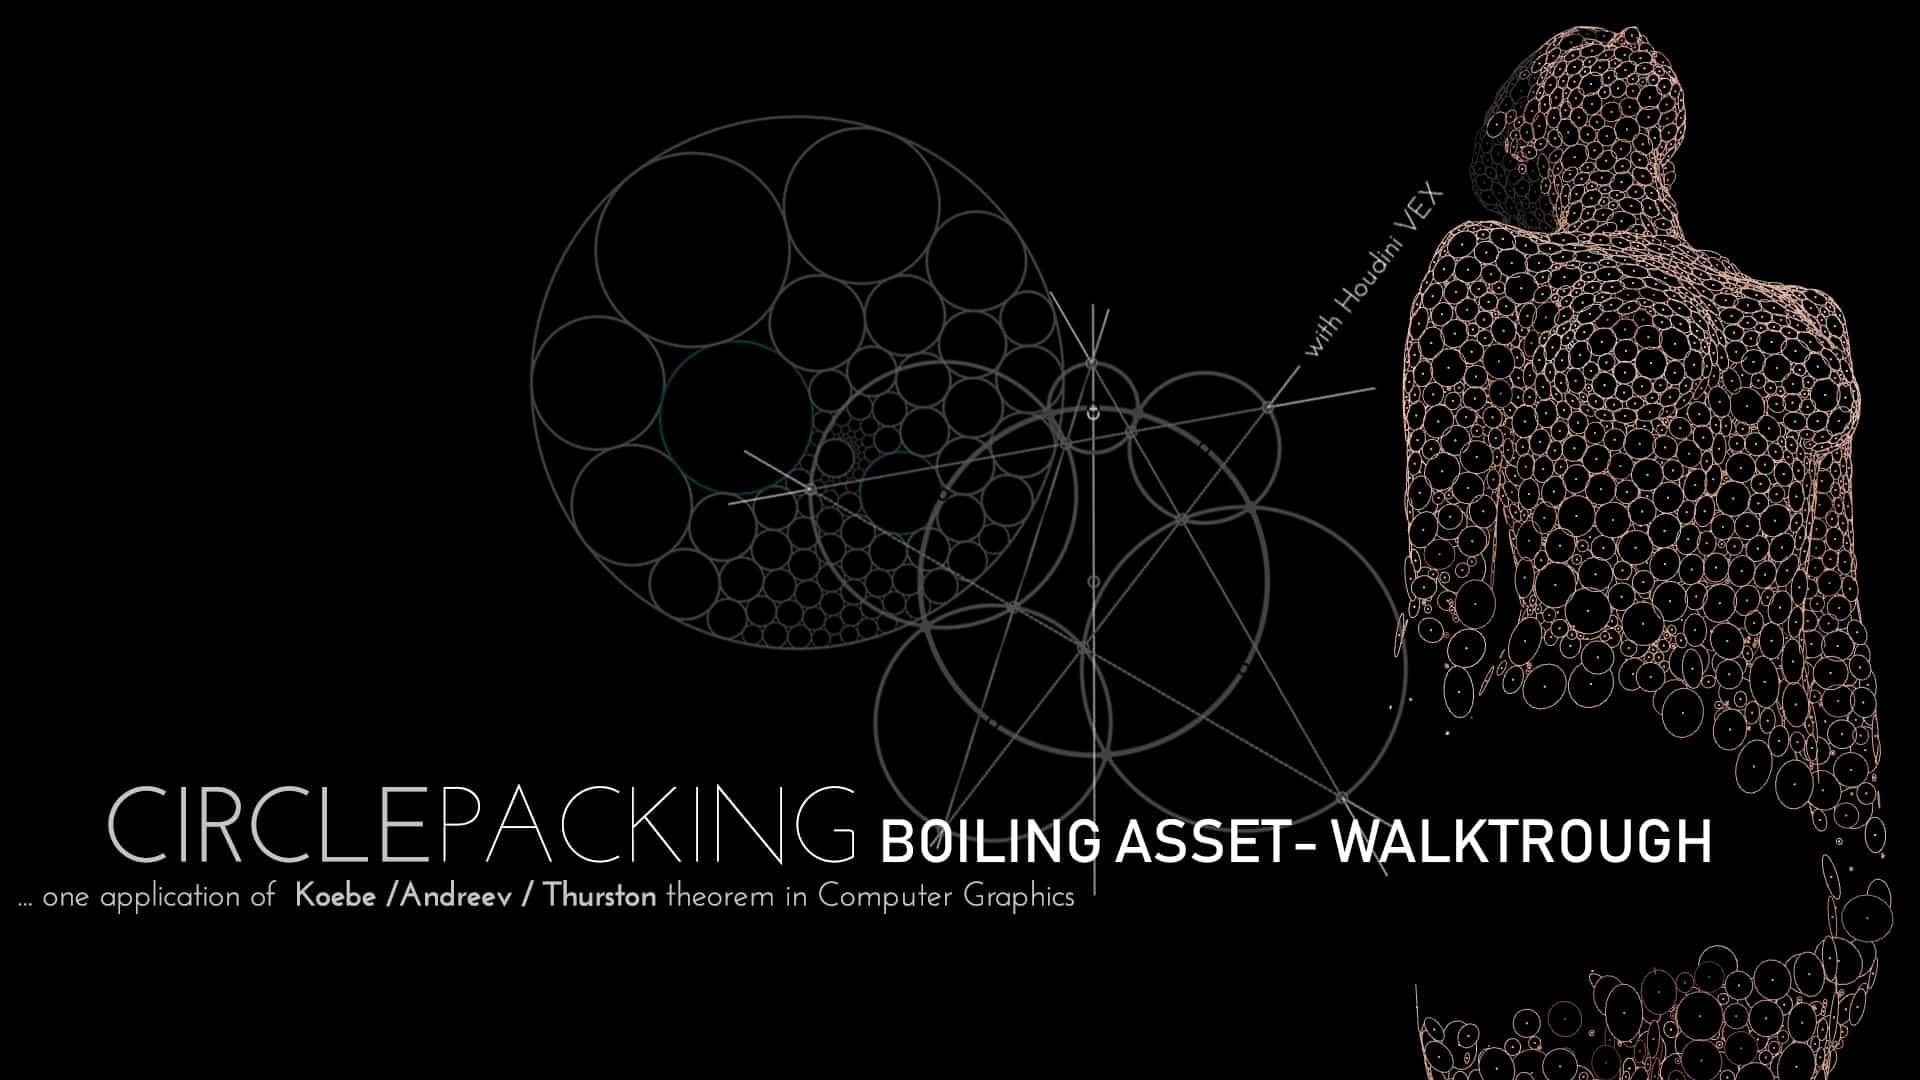 Boiling Tool - Houdini Asset (Circle Packing Algorithm)